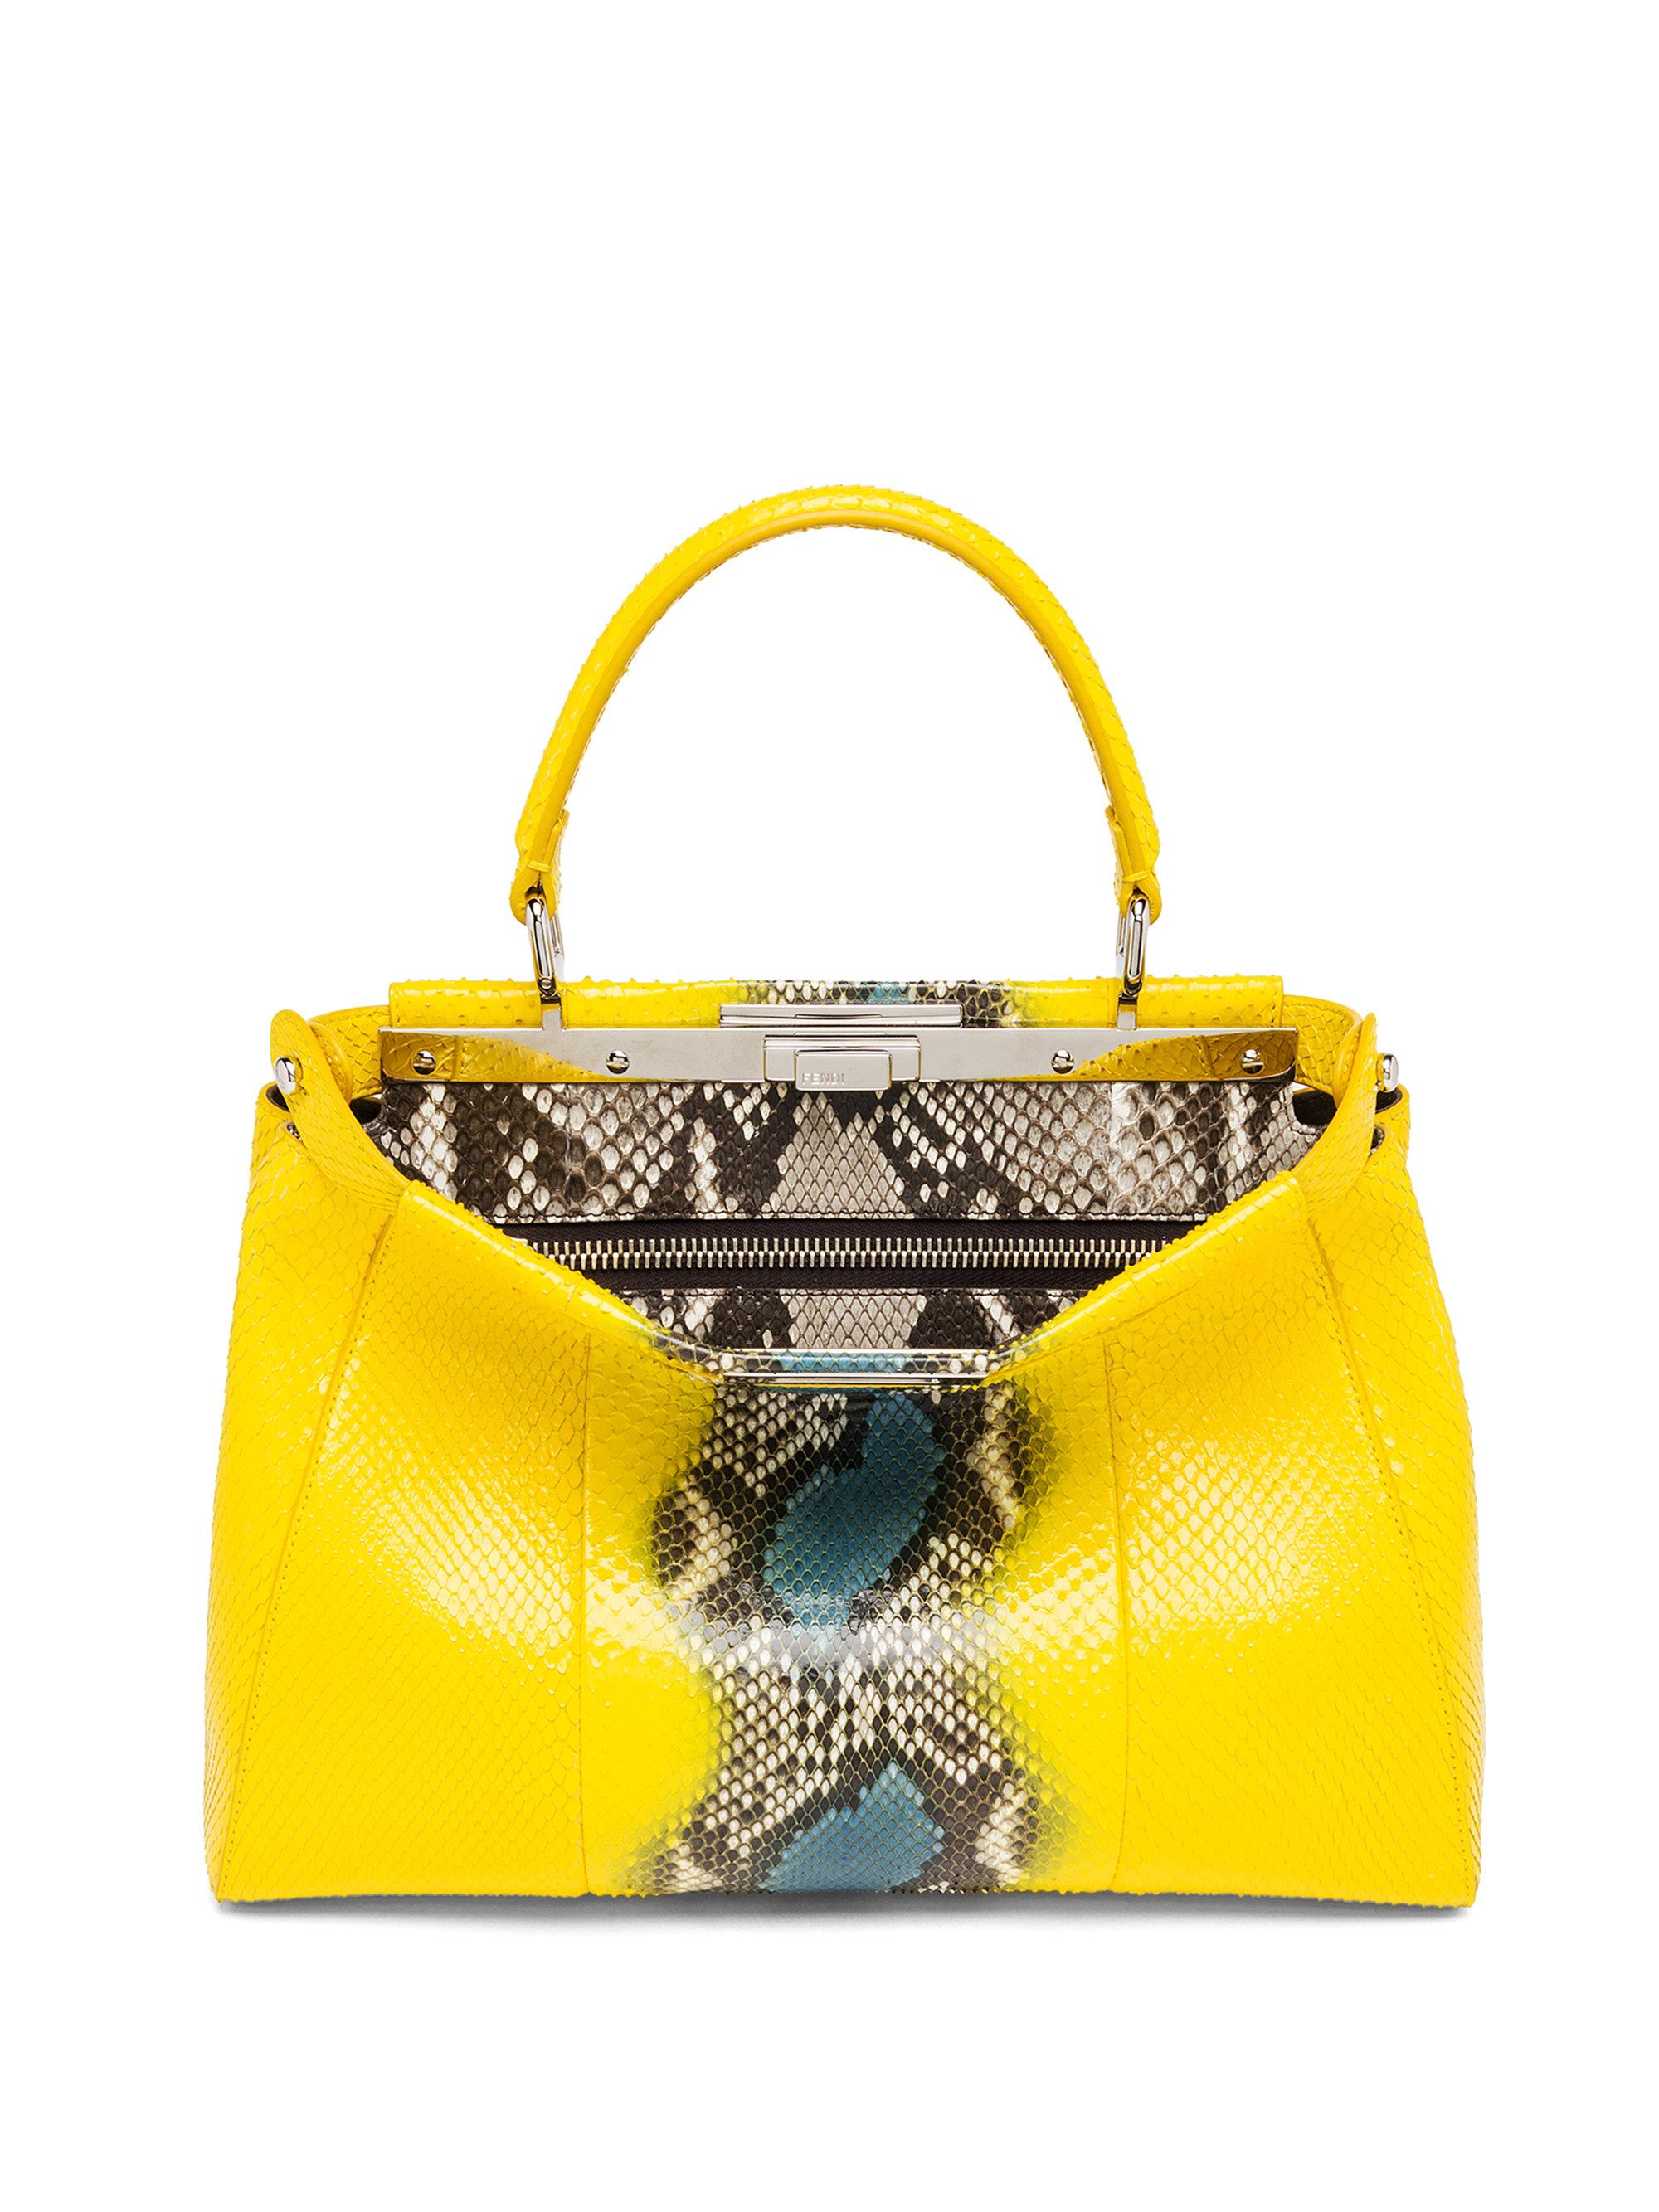 1f000d2ac4c2 Lyst - Fendi Peekaboo Multicolor Python Satchel in Yellow